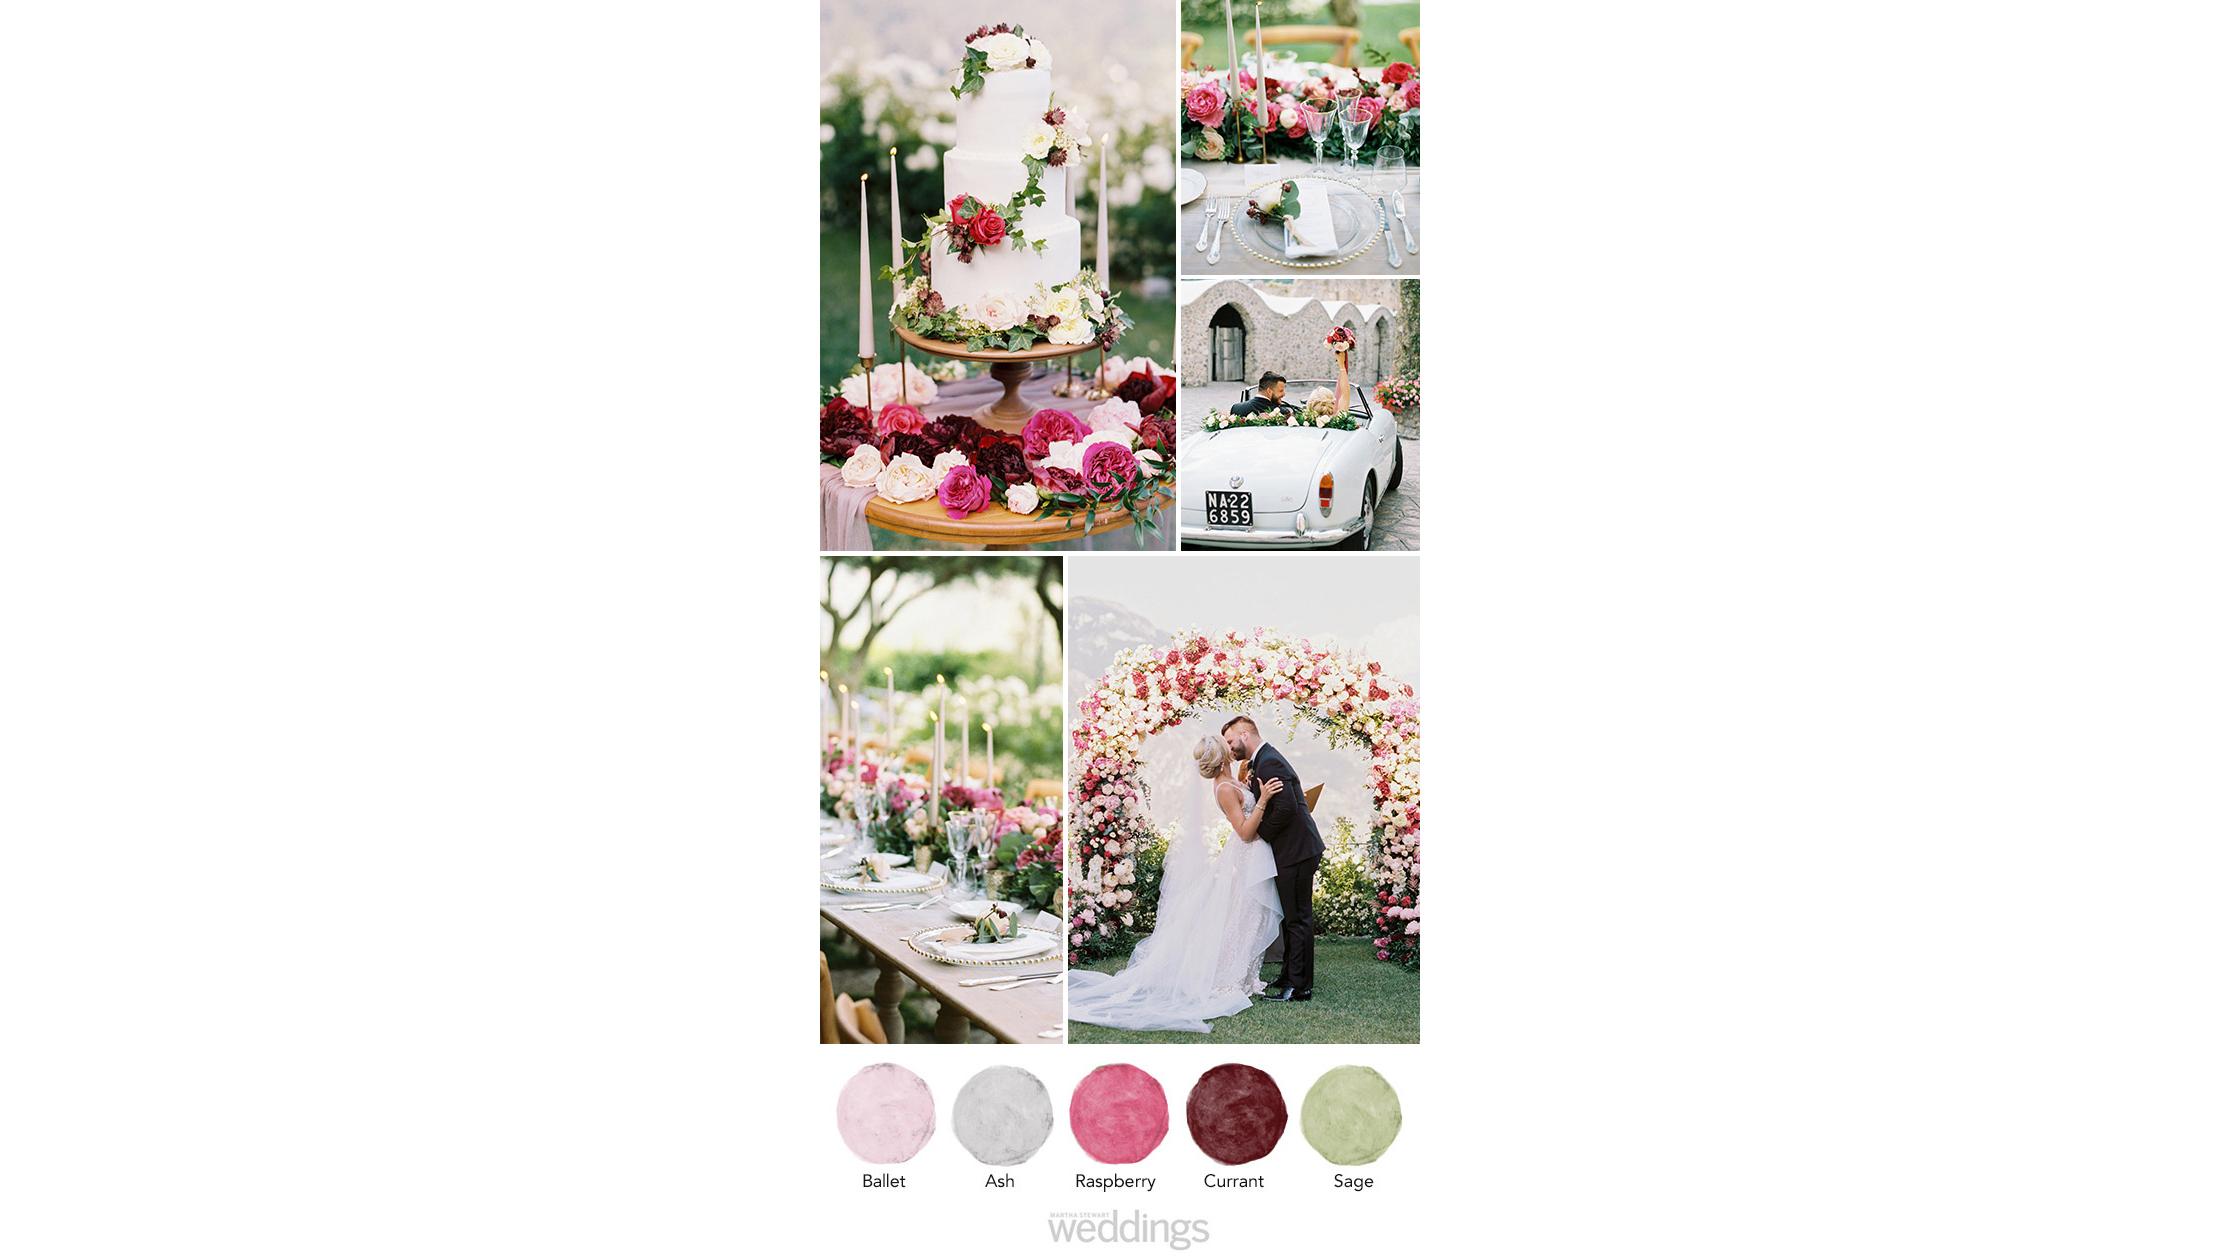 raspberry wedding color palette ideas